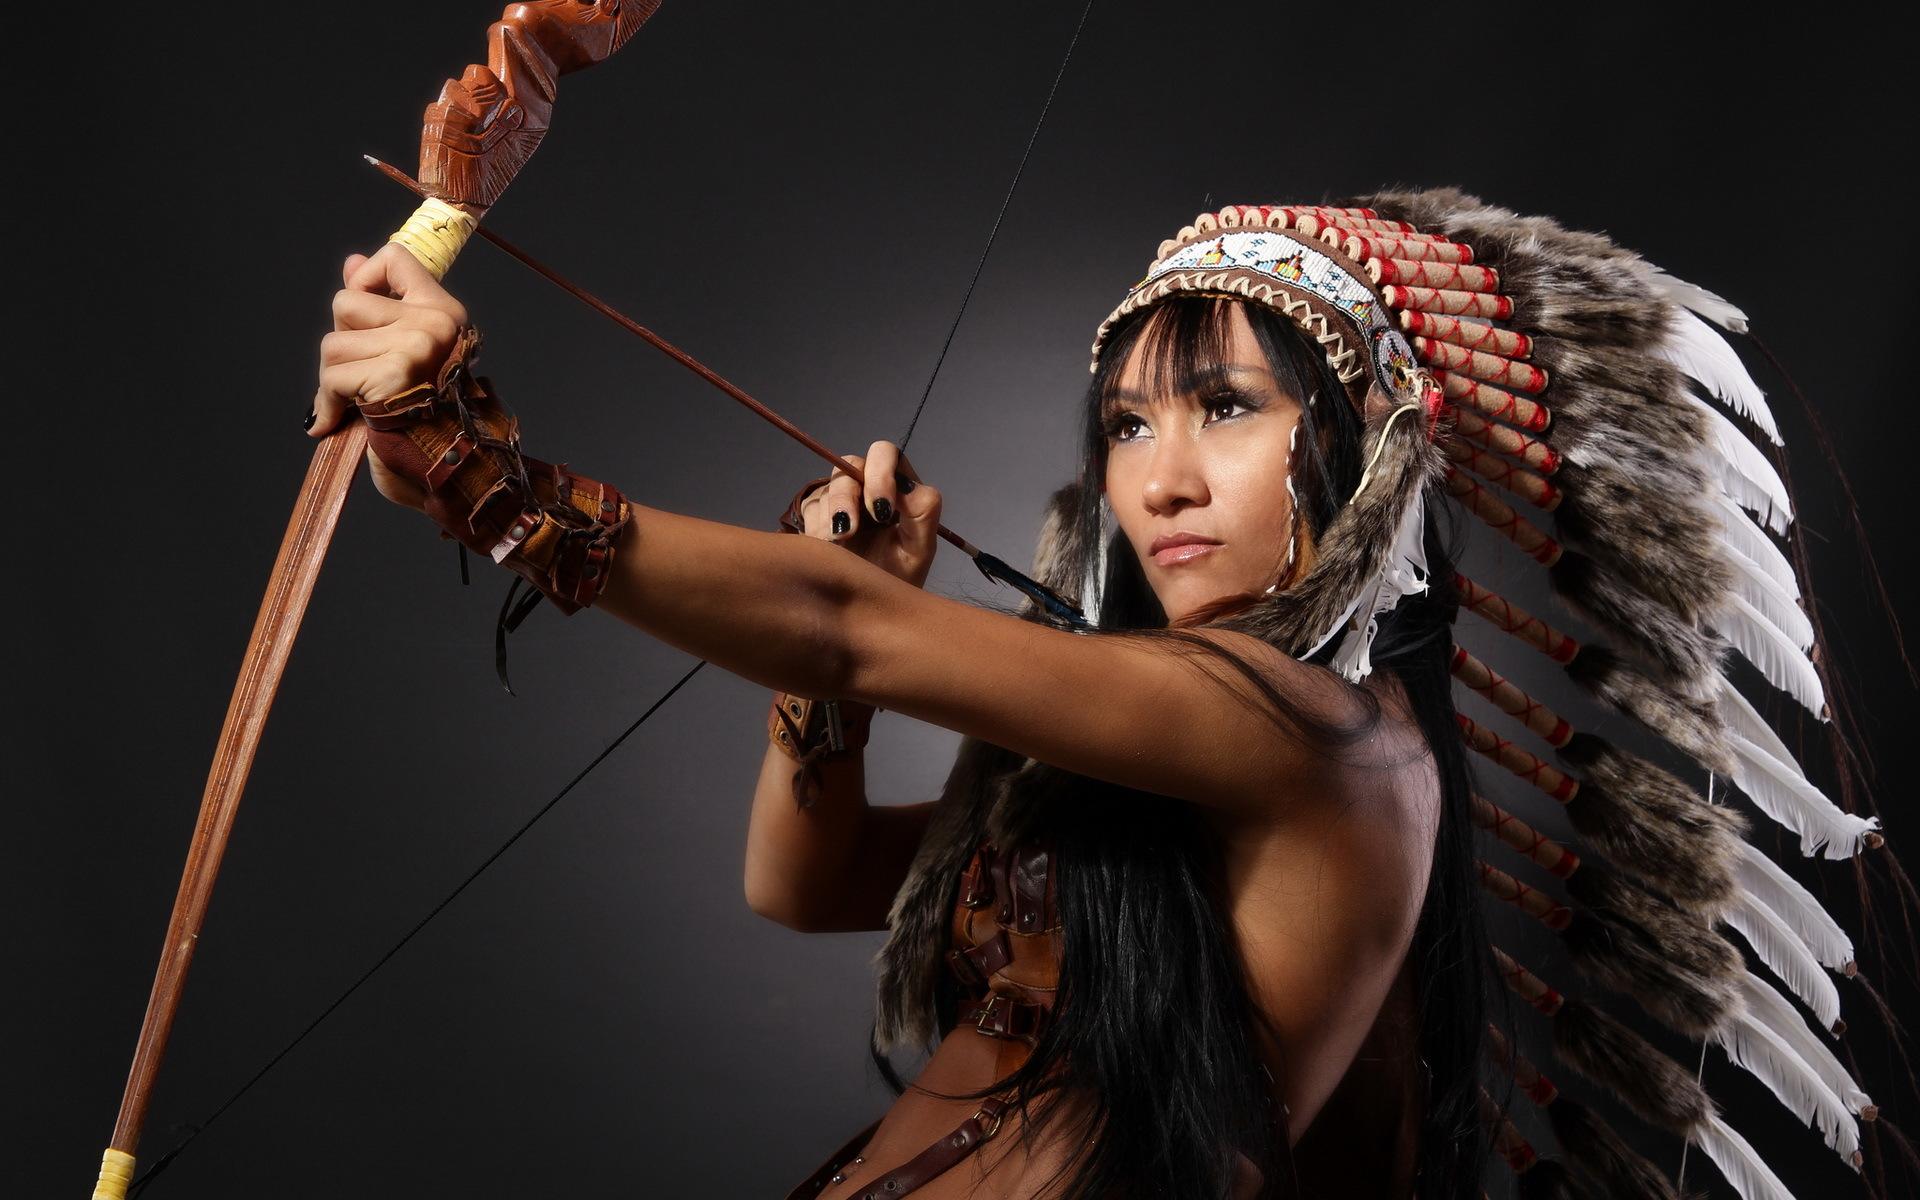 American Graffiti Cars Wallpaper Girl Native American Backgrounds Pixelstalk Net